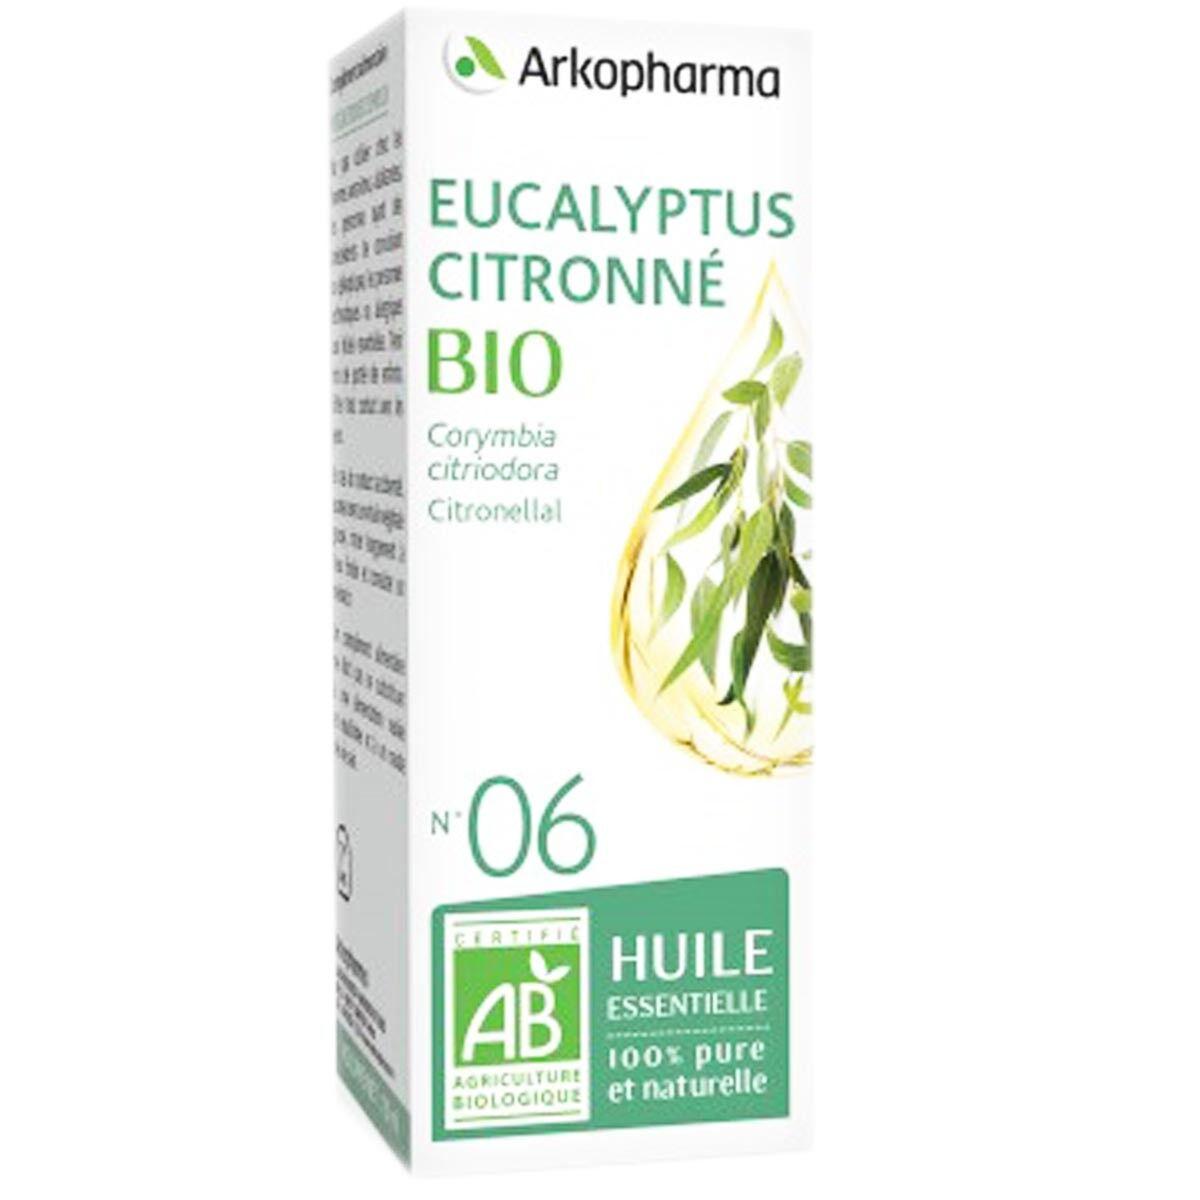 Arkopharma huile essentielle eucalyptus citronne bio n°06 10 ml